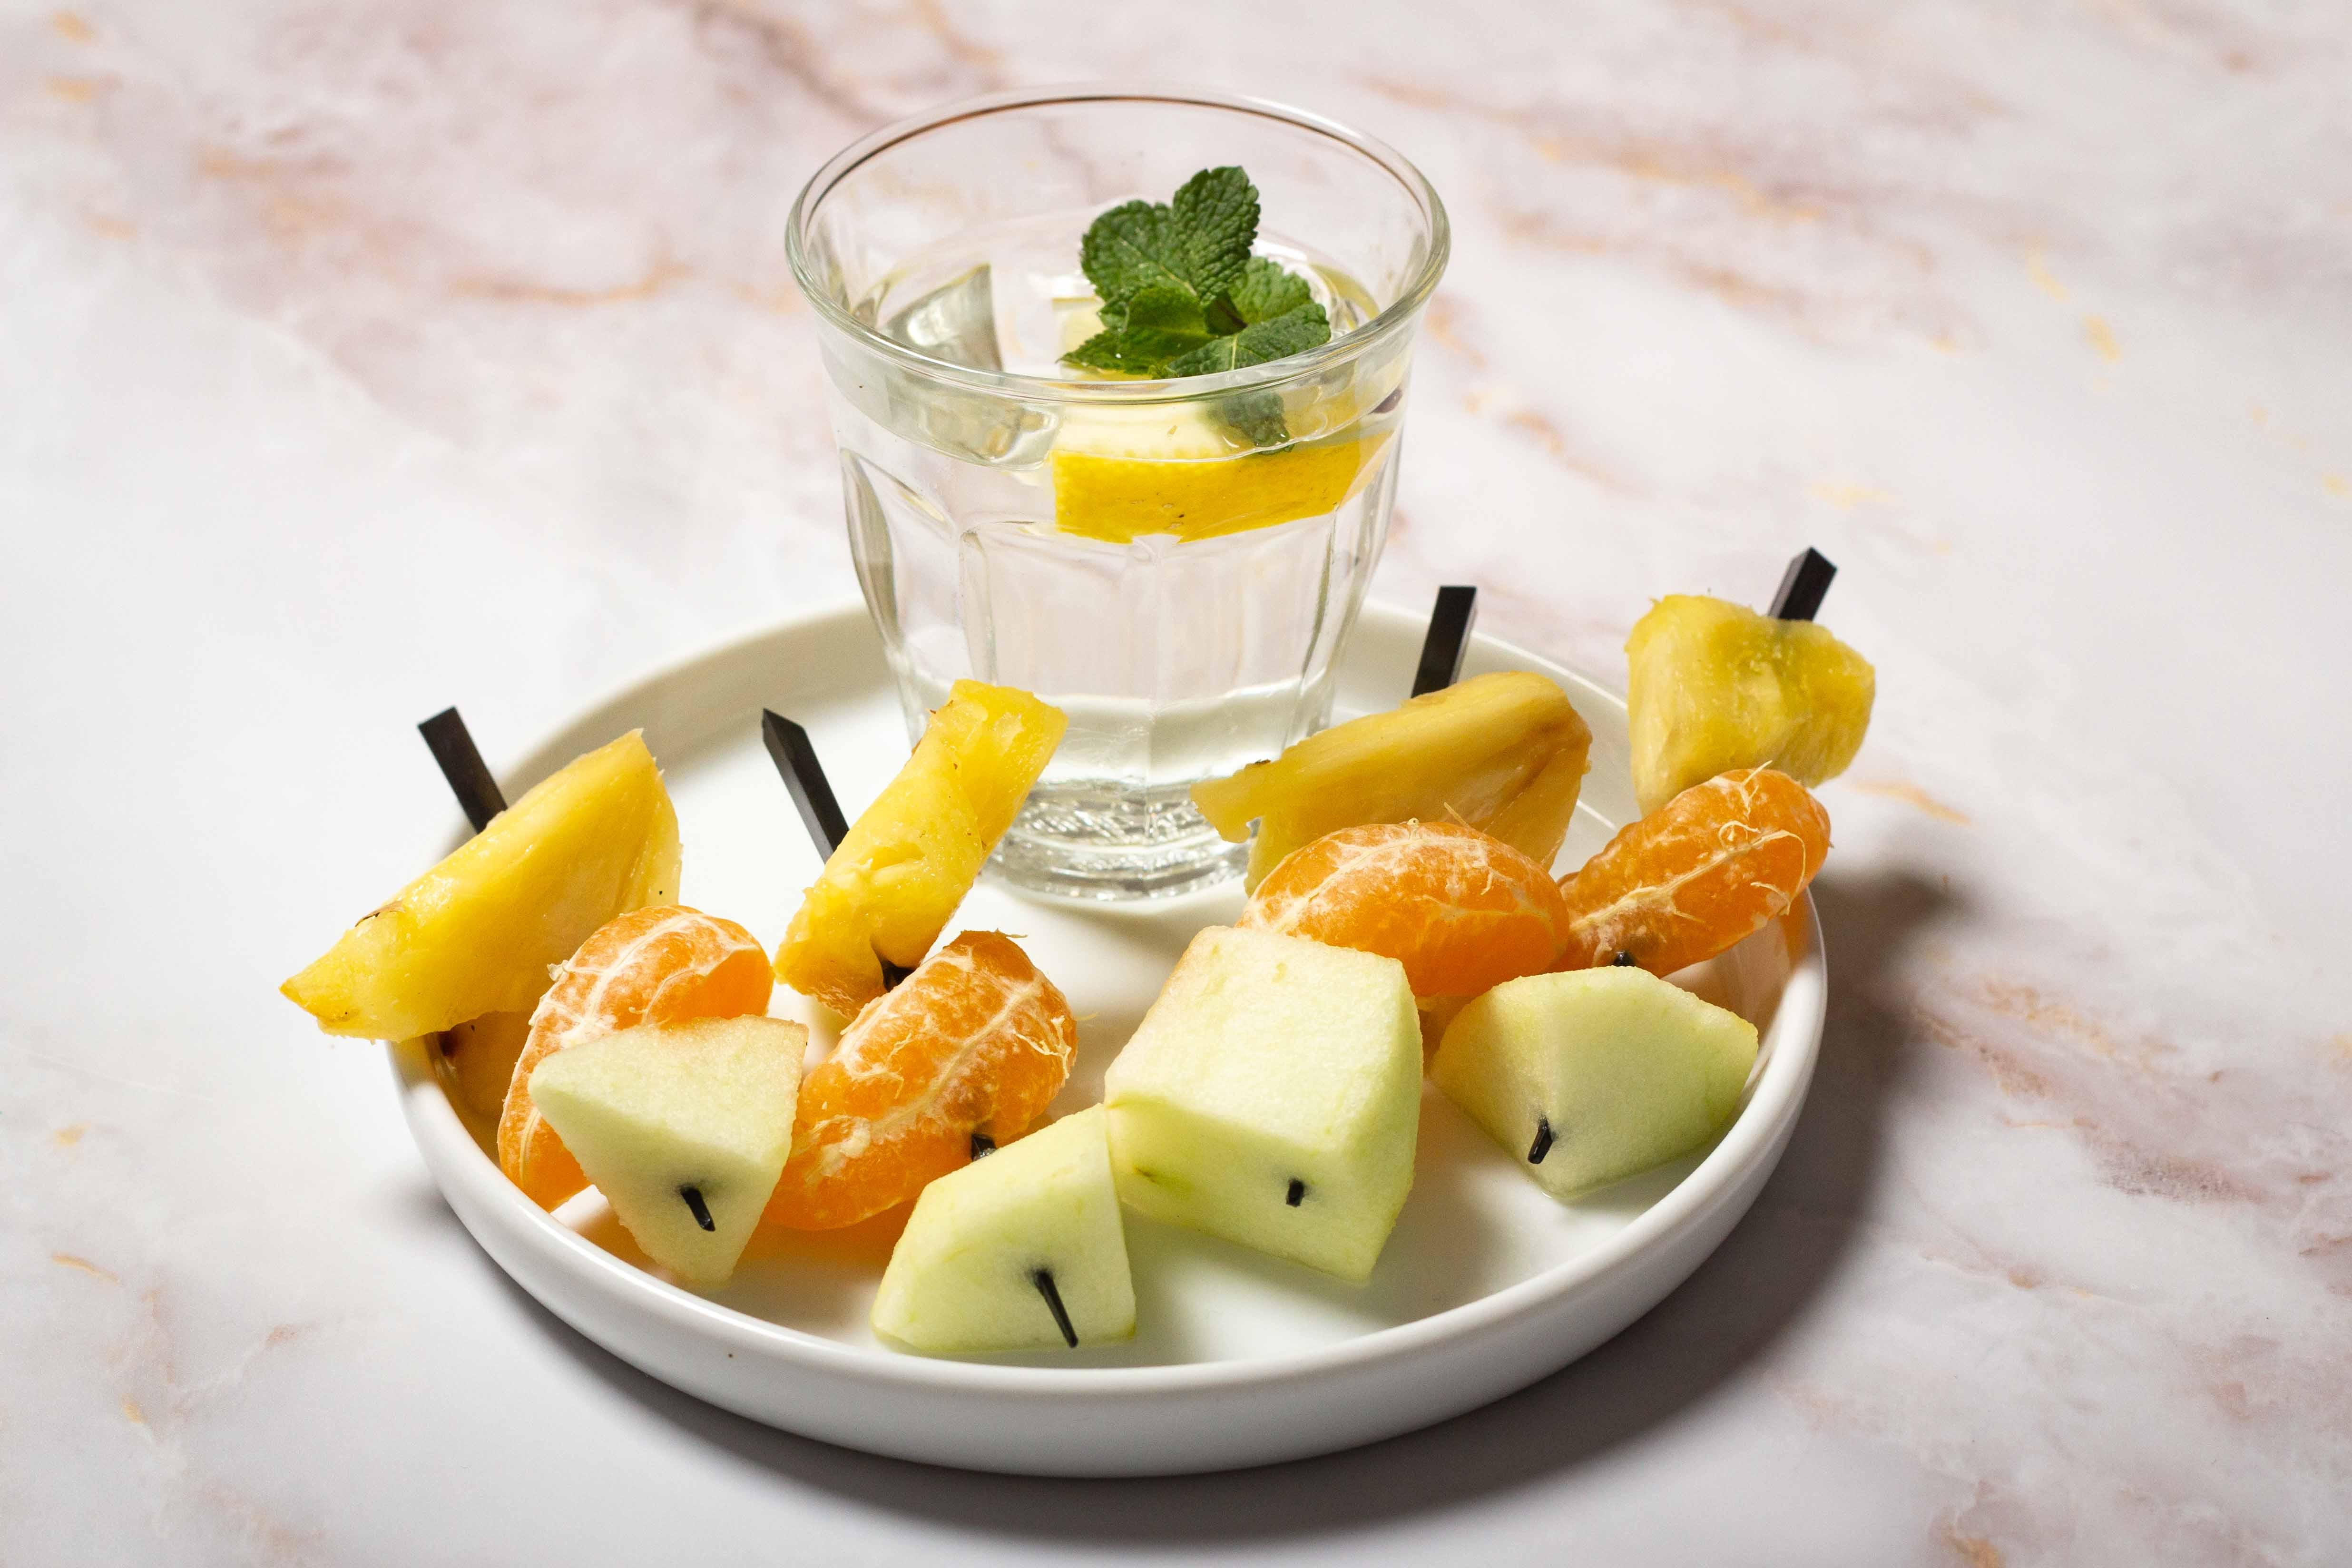 Petit_dej_3_brochettes_fruits.jpg